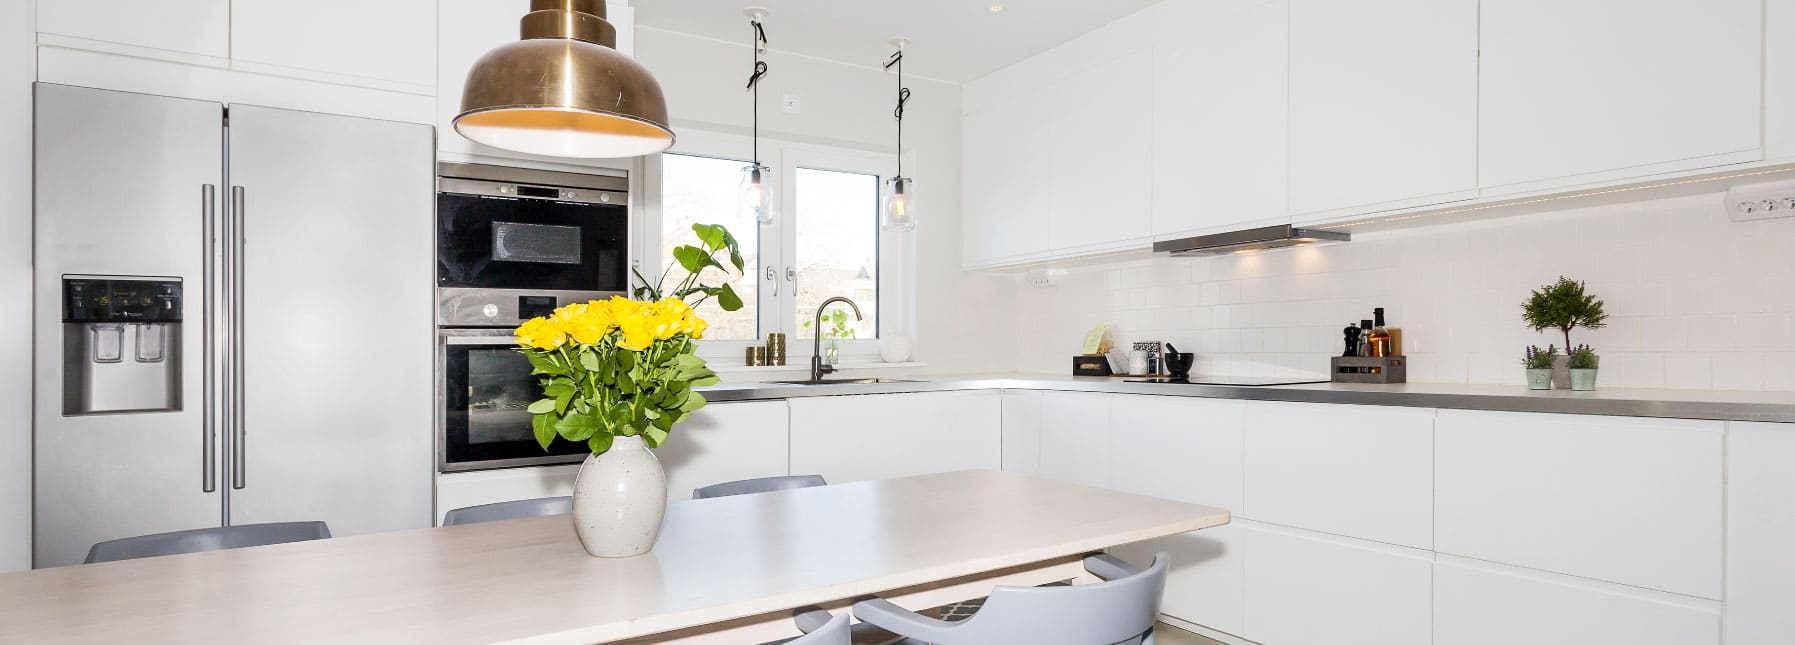 Flat Pack Kitchens & Cabinets Brisbane - Shop Online | Quick Kitchens |